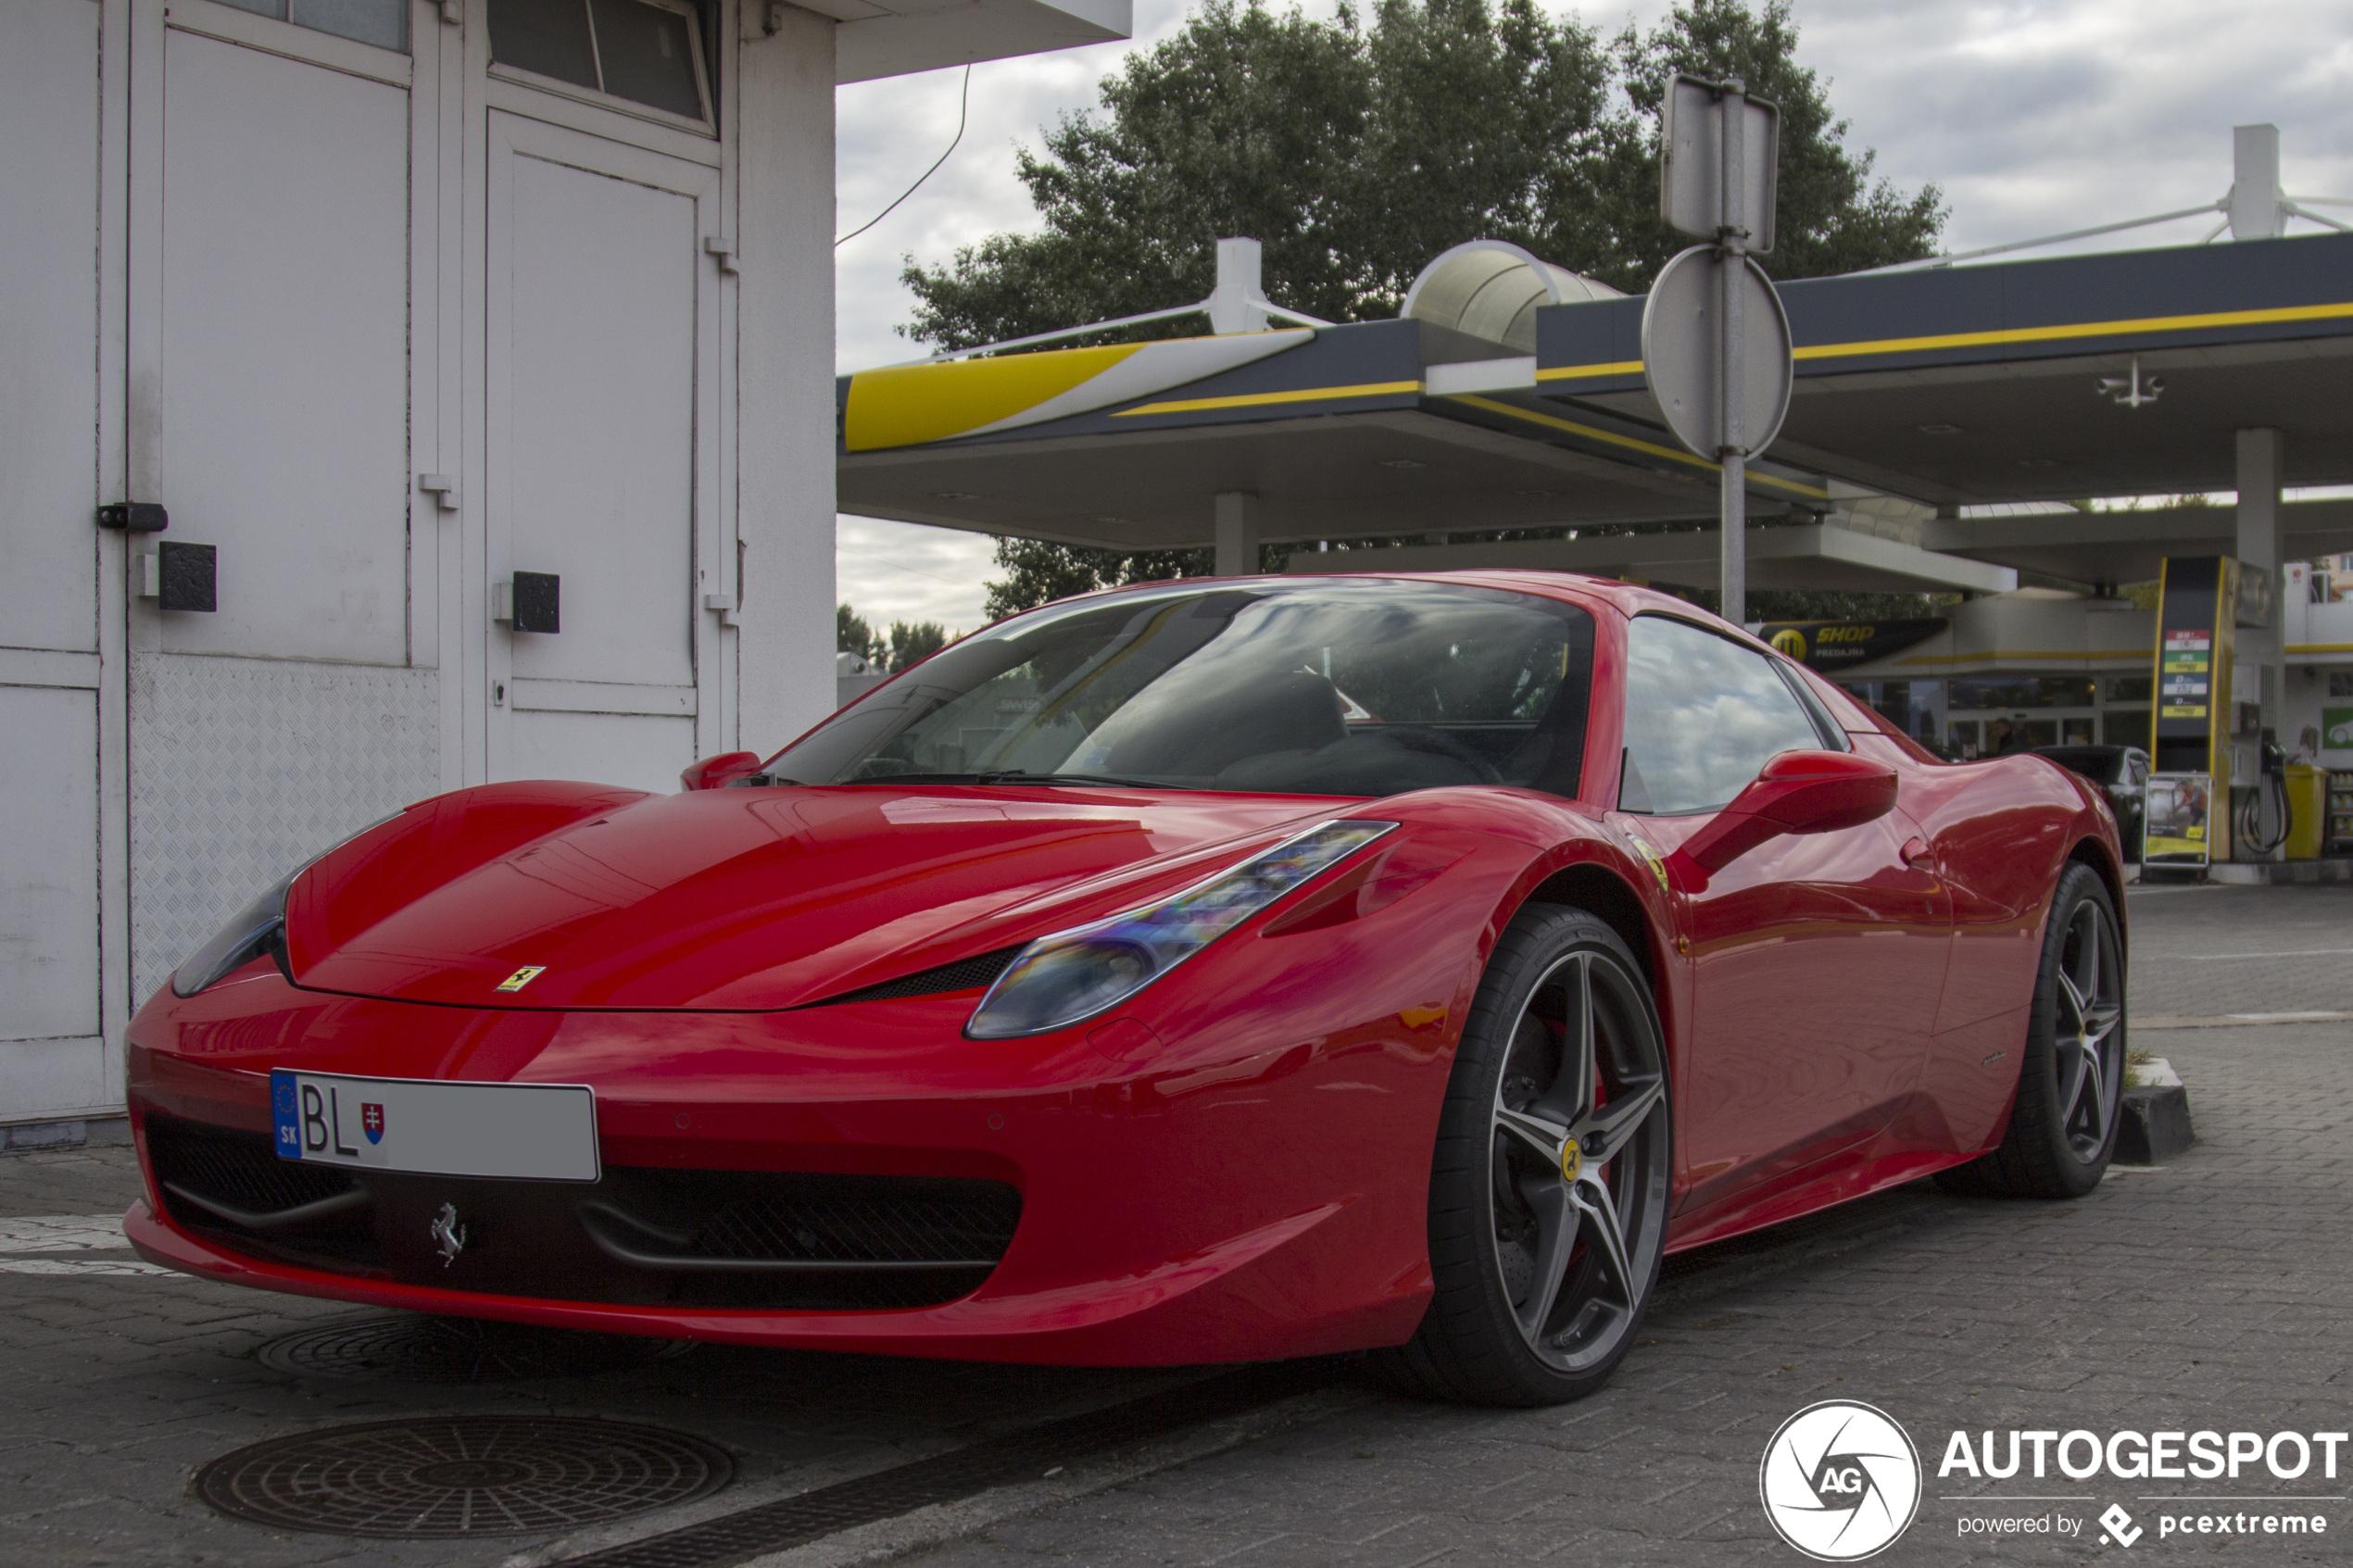 Ferrari 458 Spider - 28 March 2020 - Autogespot